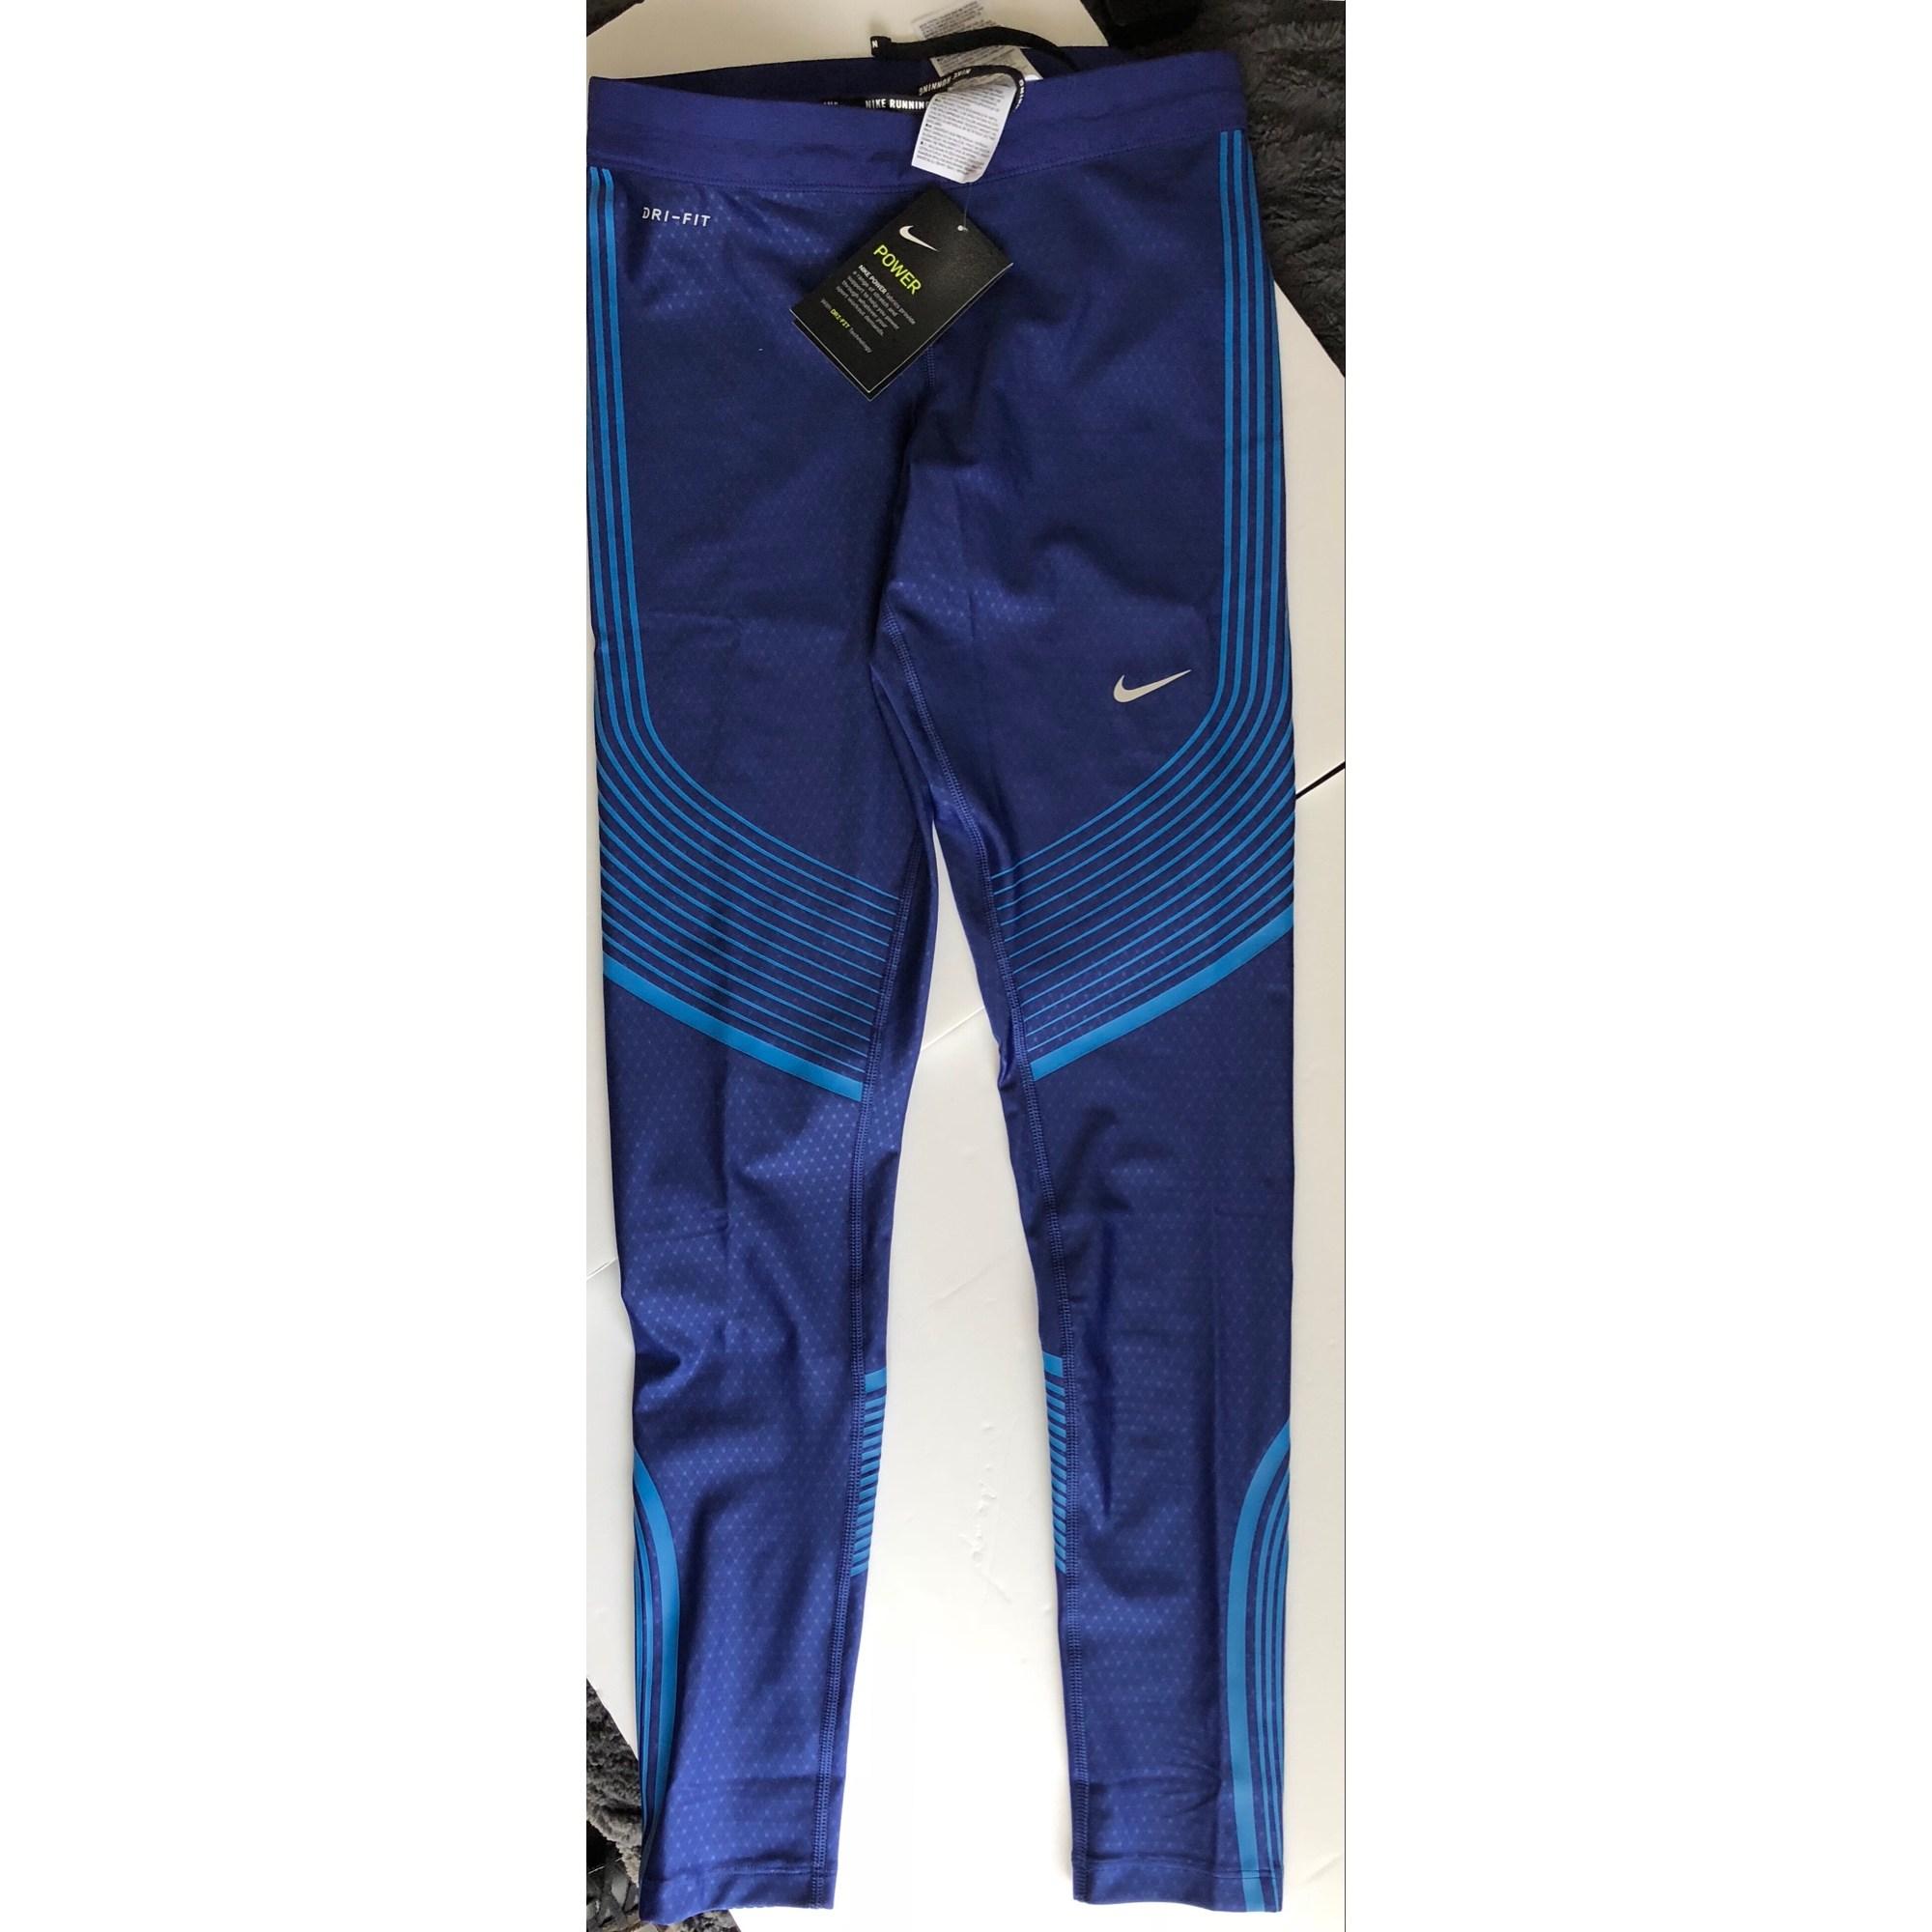 pantalon de survetement nike bleu marine